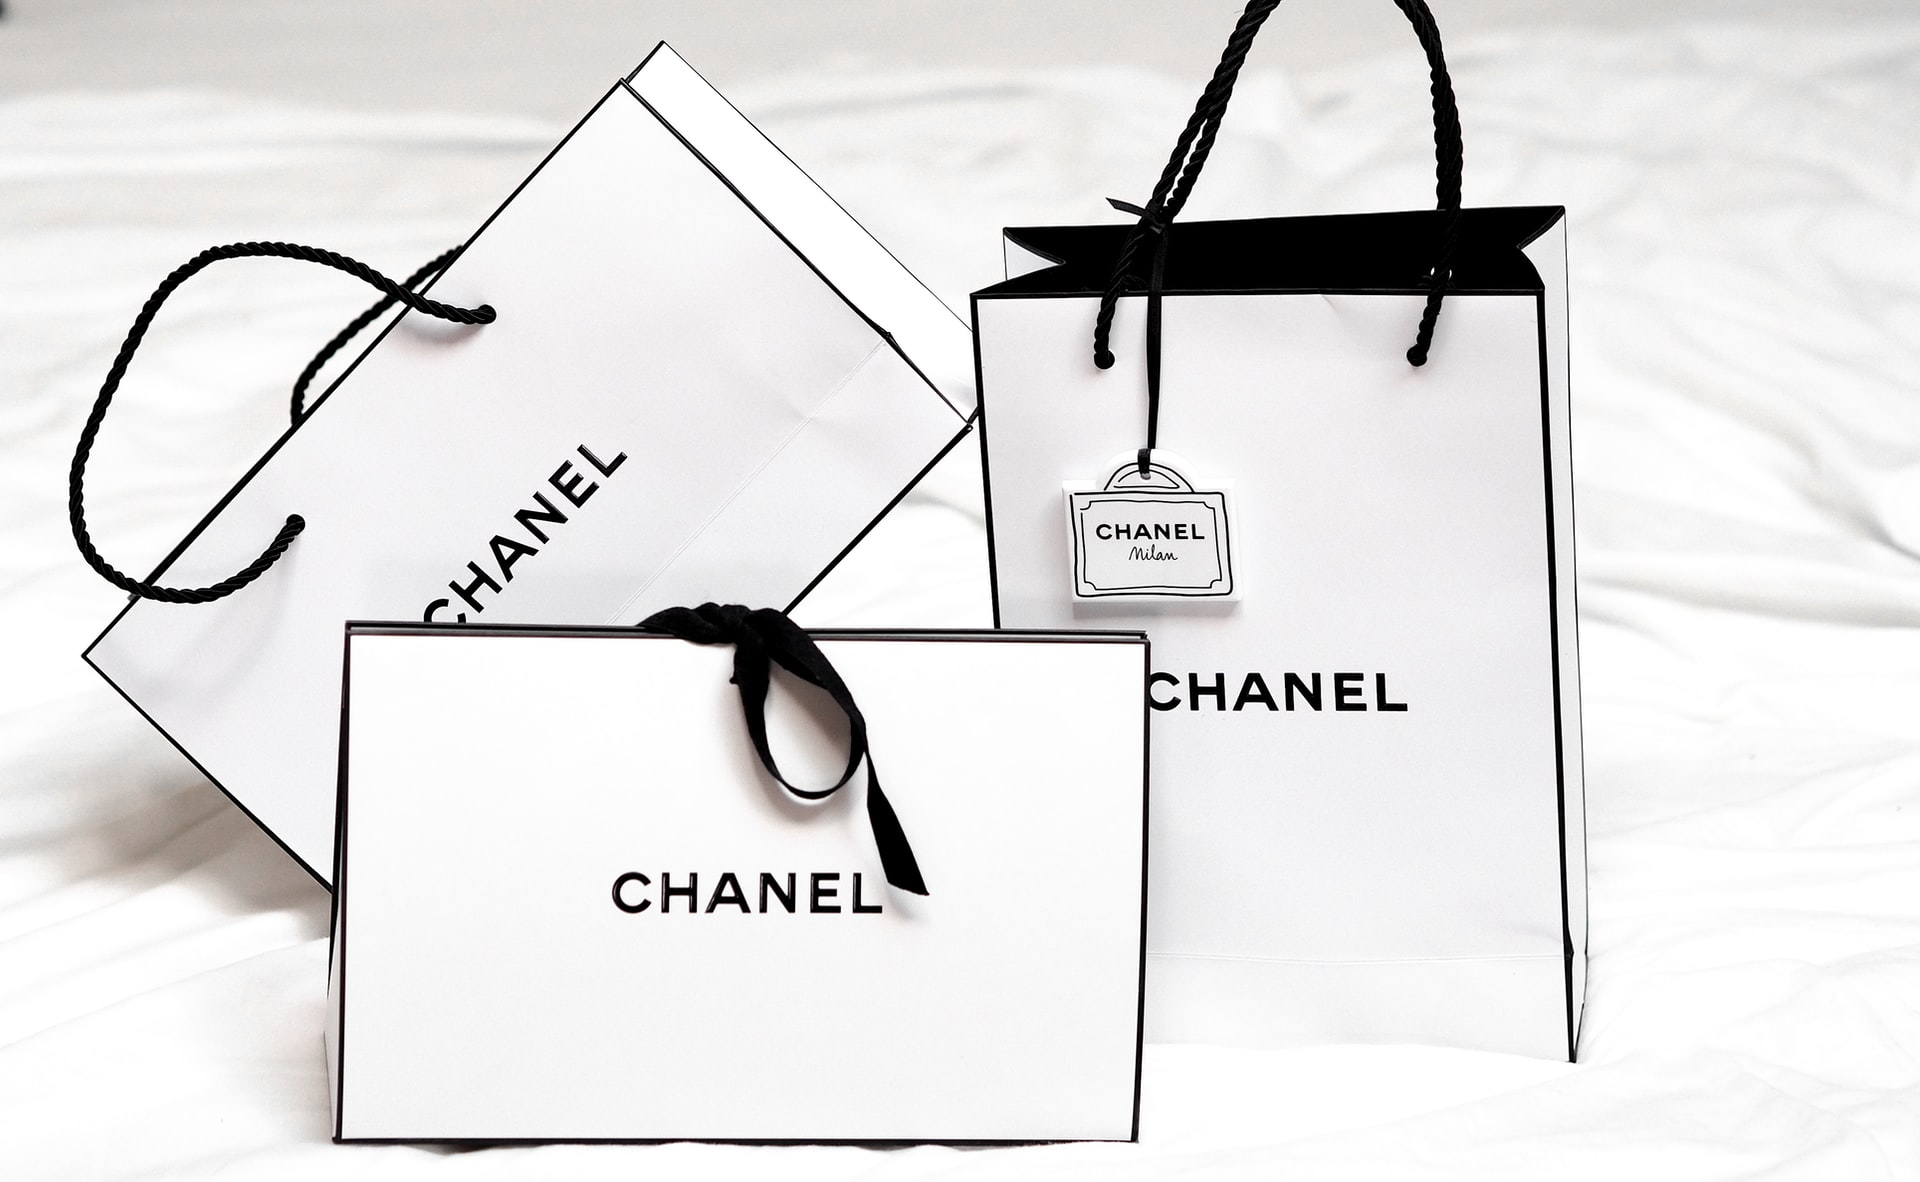 CHANEL fashion shows